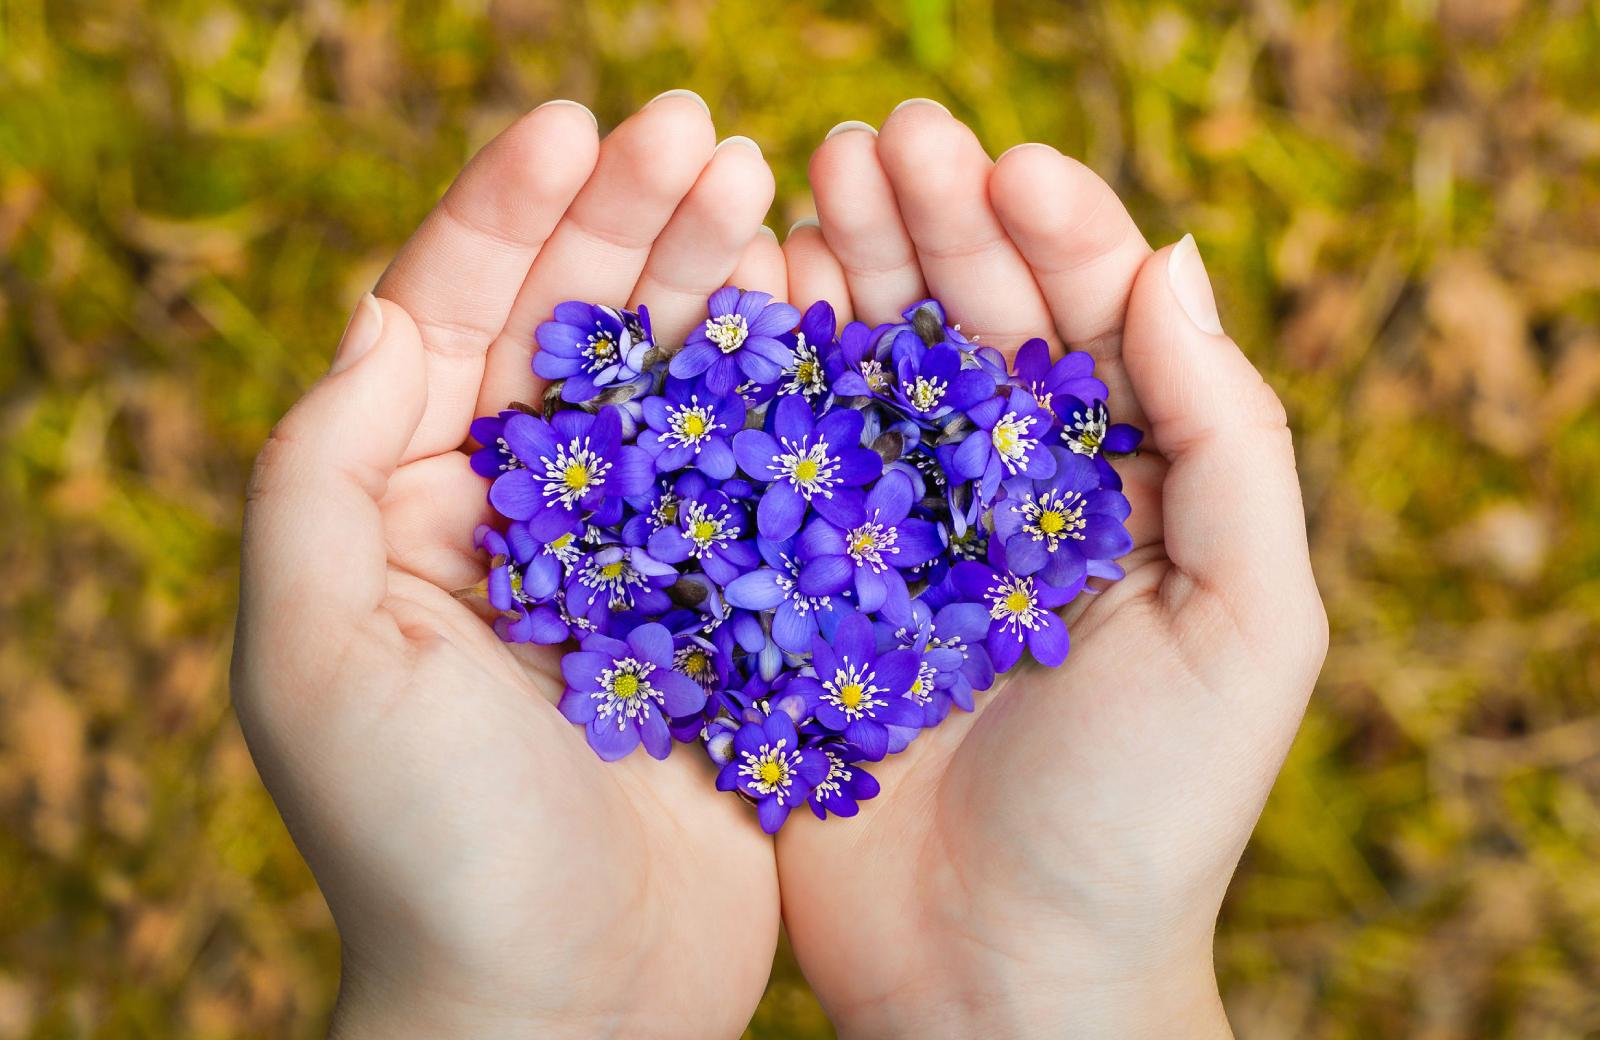 Beautiful Flowers - The Waypointe Apts